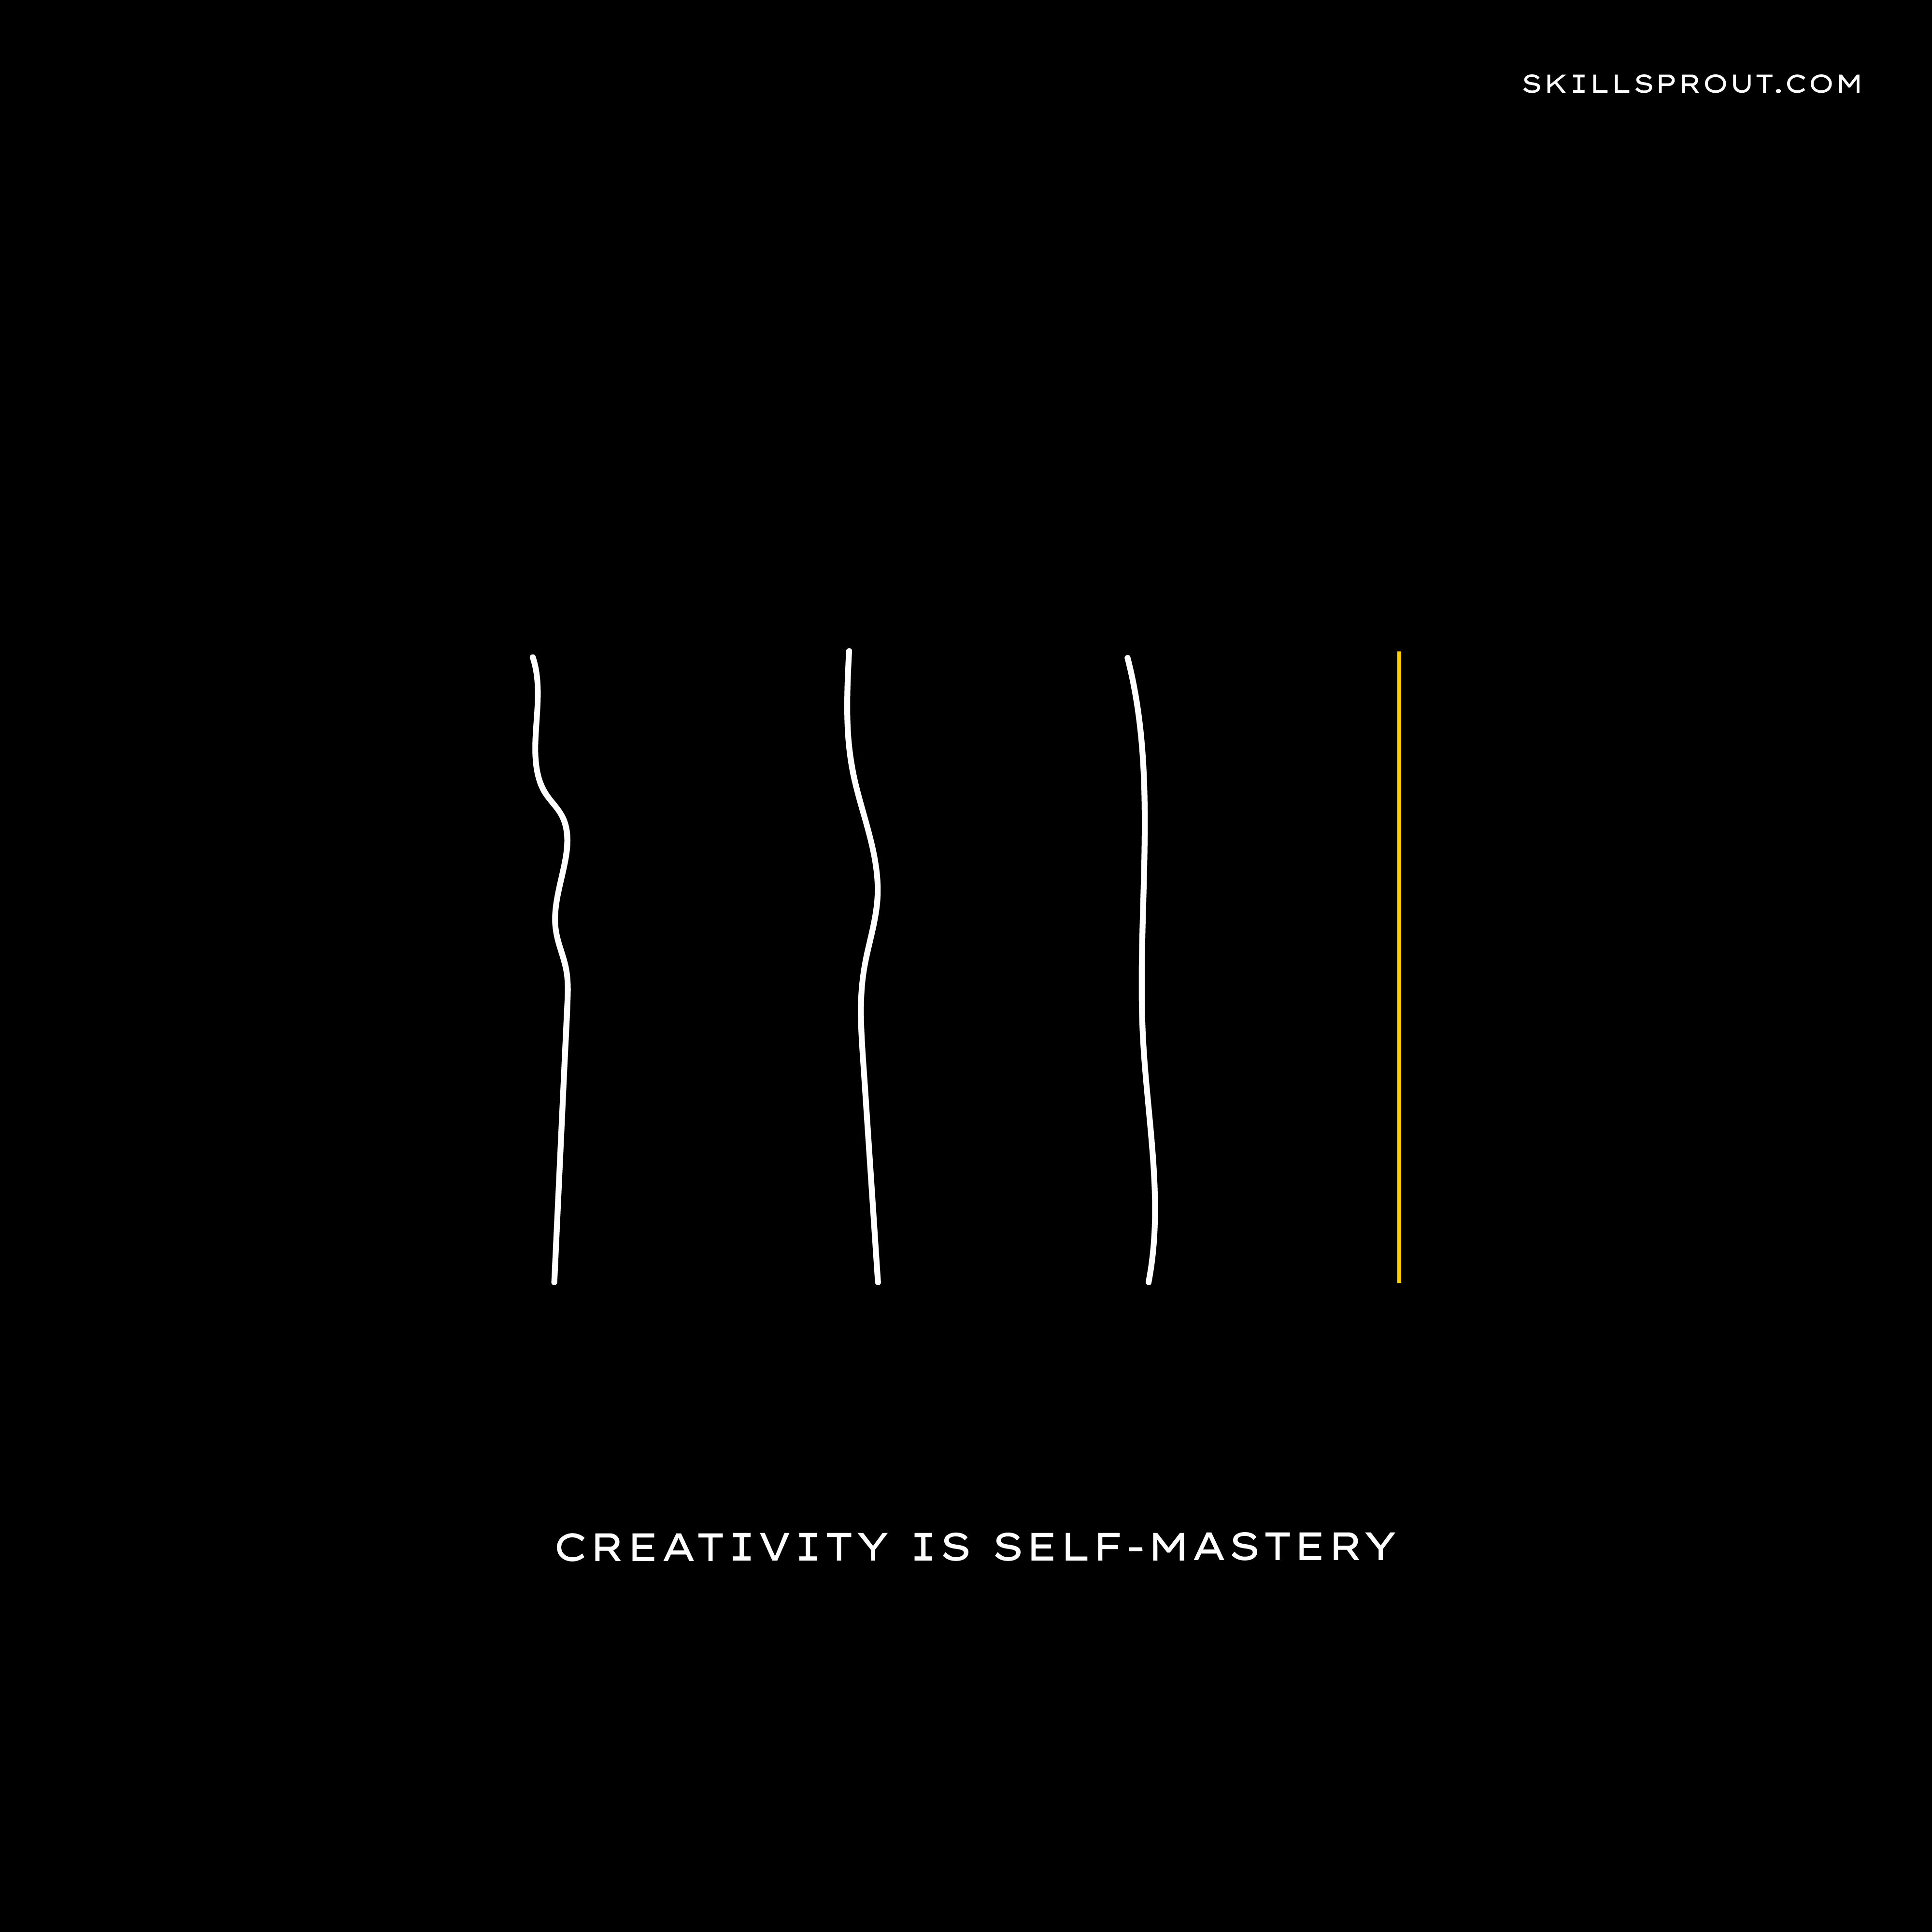 Creativity is self-mastery